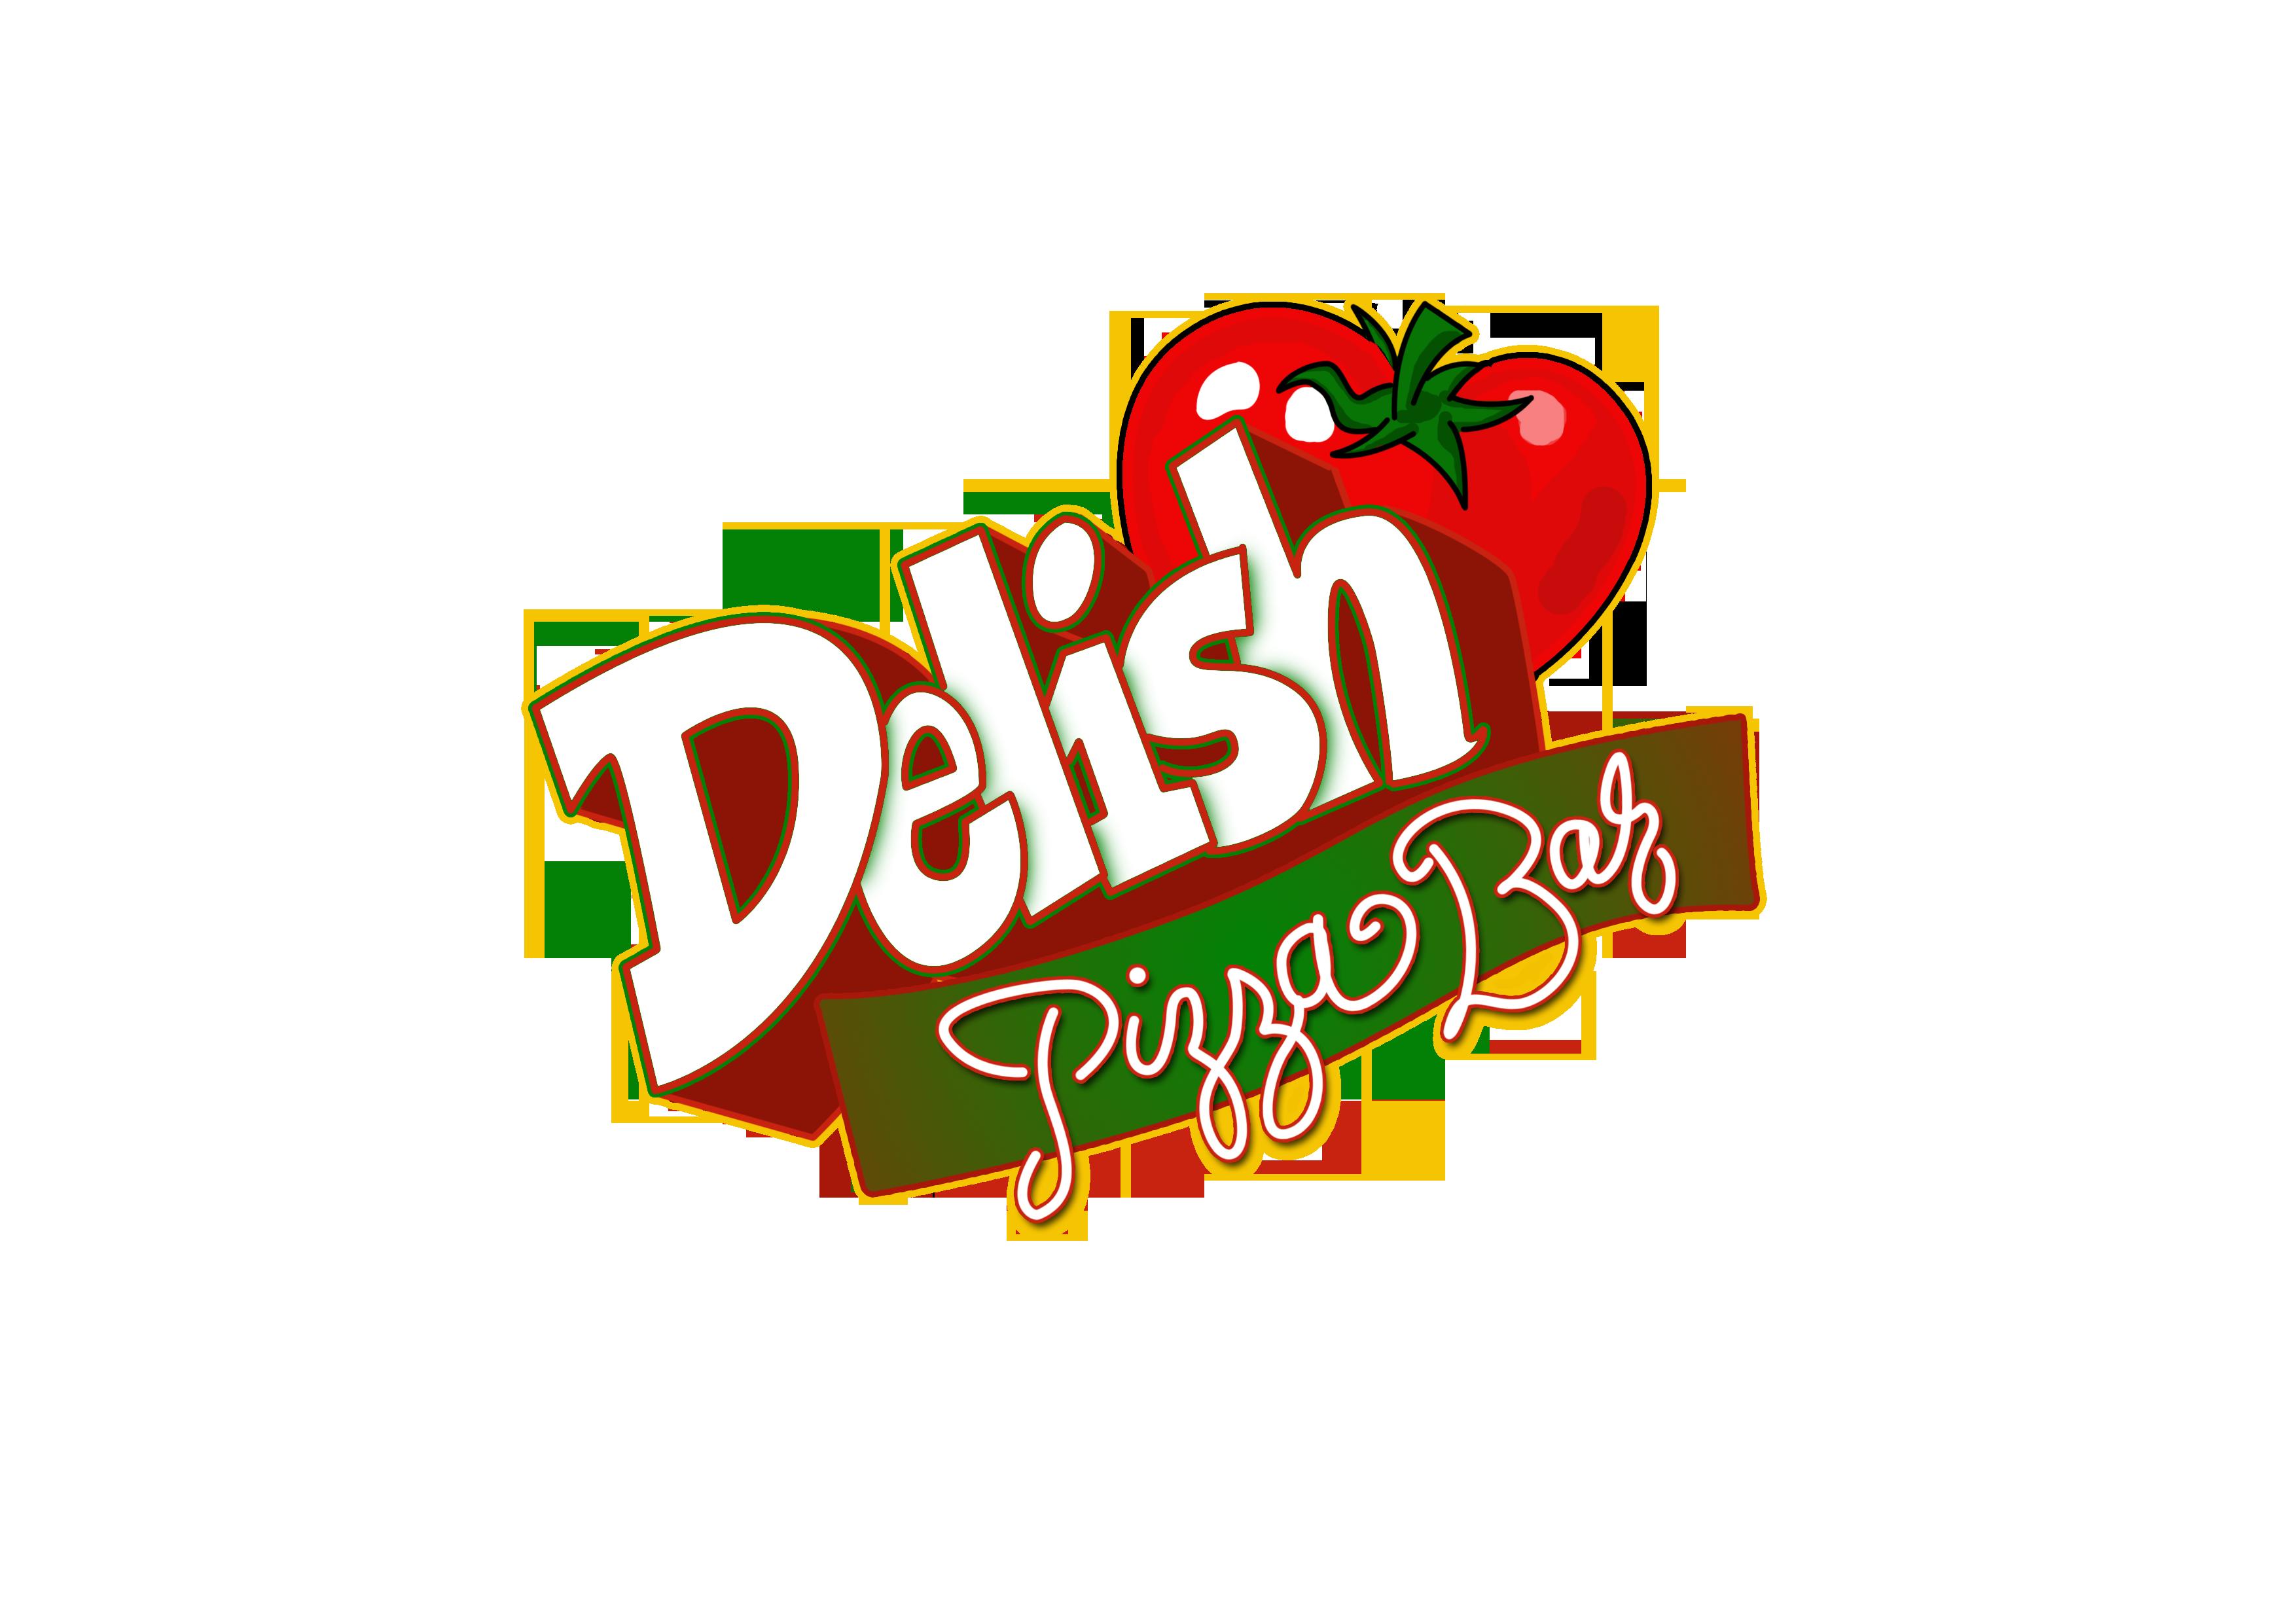 Delish Pizza Bar